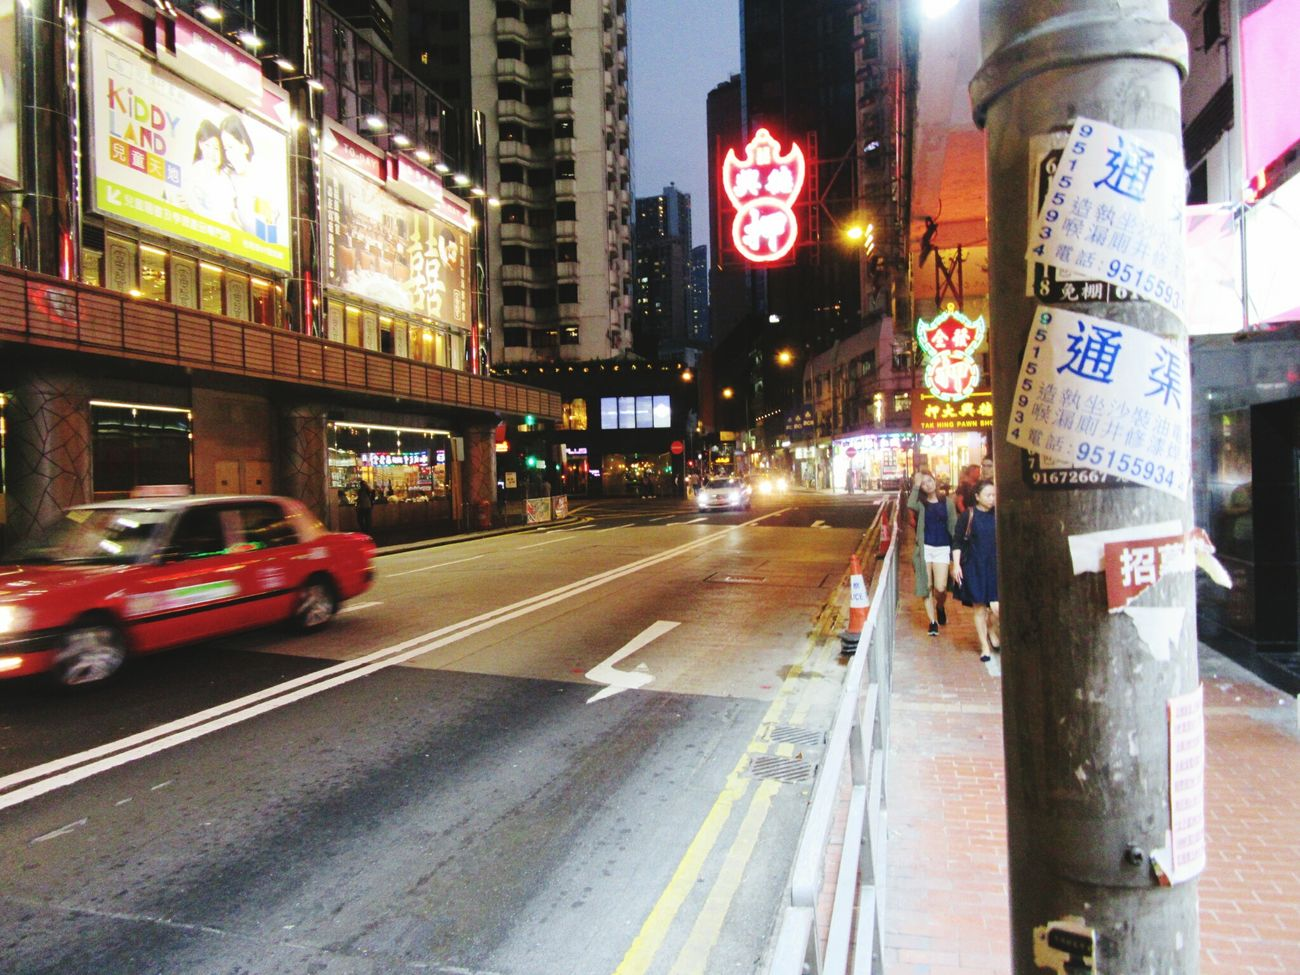 Illuminated City Night City Street Hongkongskyline Street Photography HongKong Hongkongphotography Hongkonglife Hongkongcollection Hong Kong City Hongkongcity Hongkongstreet Public Transportation The Street Photographer - 2017 EyeEm Awards City Street